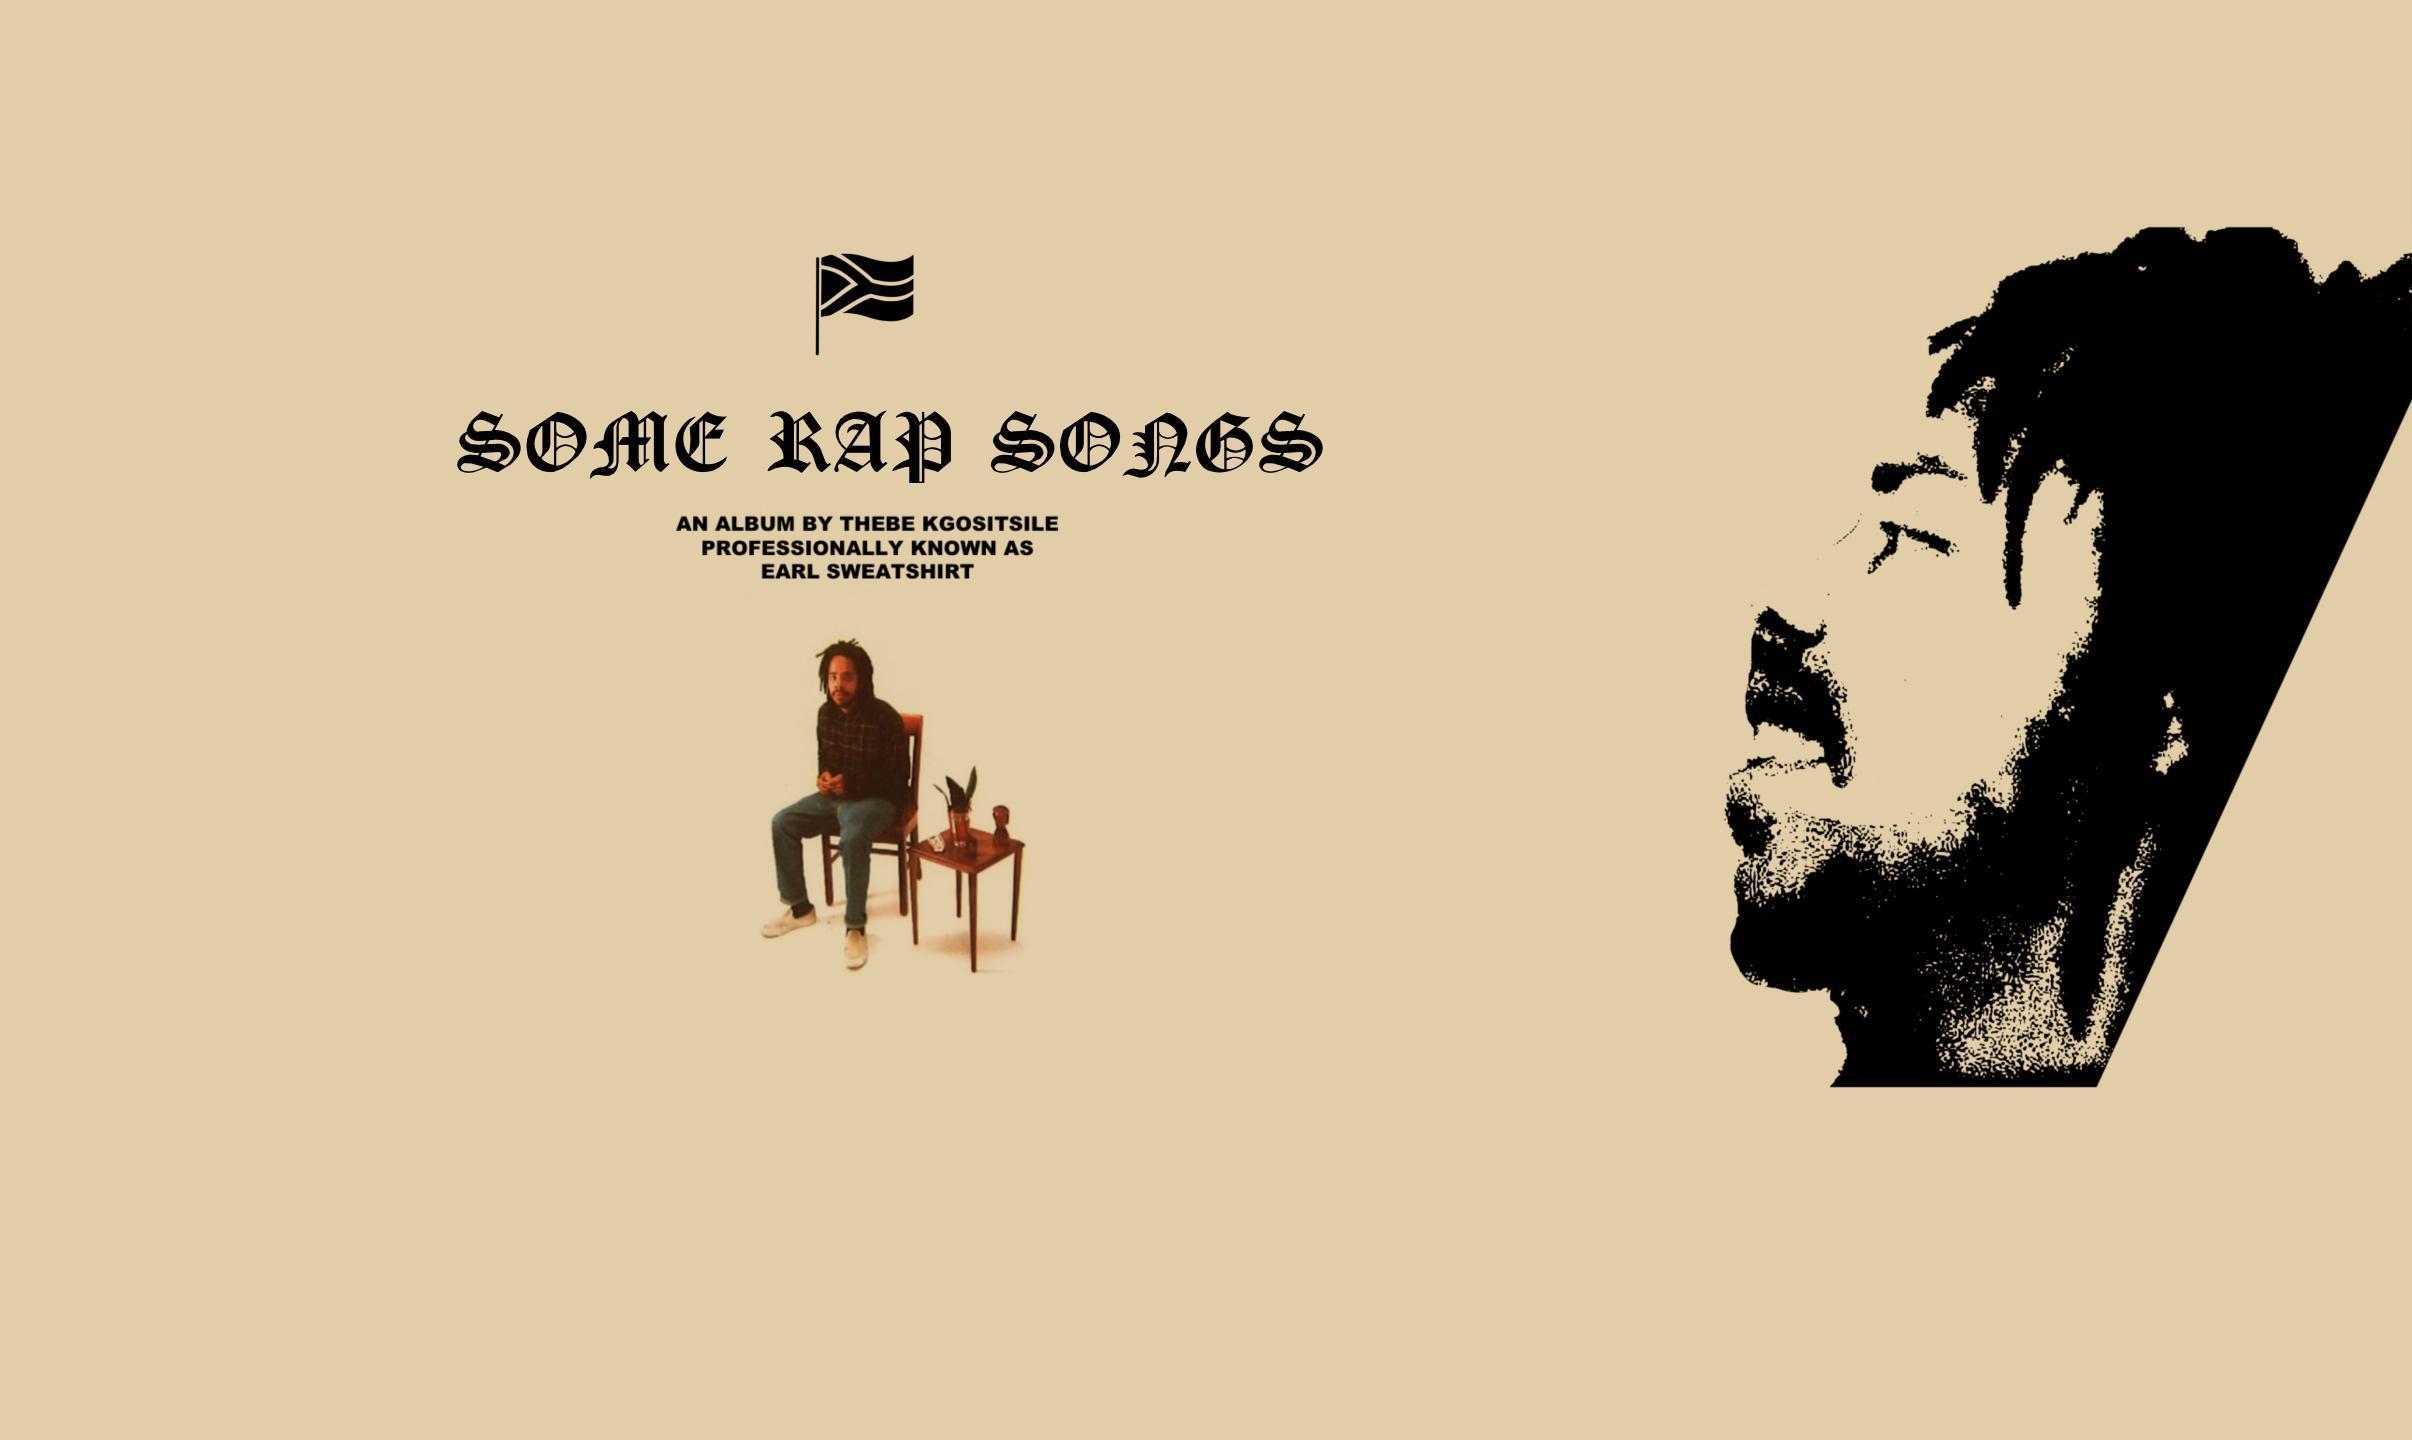 Some rap songs – l'album di Earl Sweatshirt